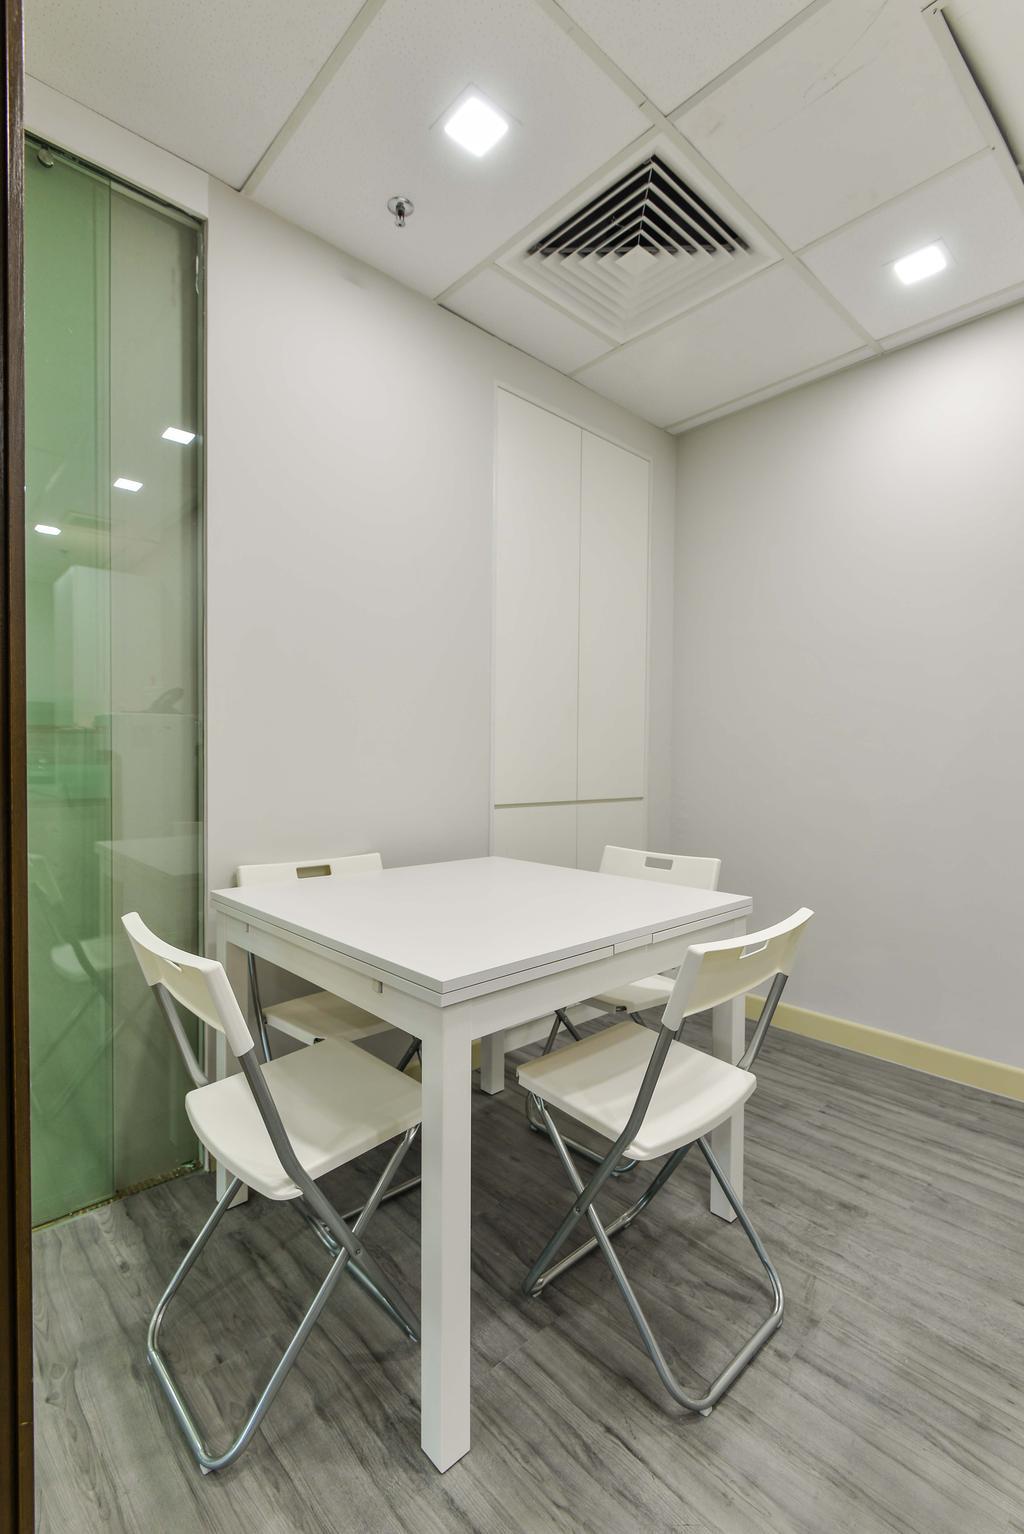 MLS Capital- G-Tower Jln Tun Razak, Commercial, Interior Designer, Torch Empire, Modern, Dining Table, Furniture, Table, Chair, Dining Room, Indoors, Interior Design, Room